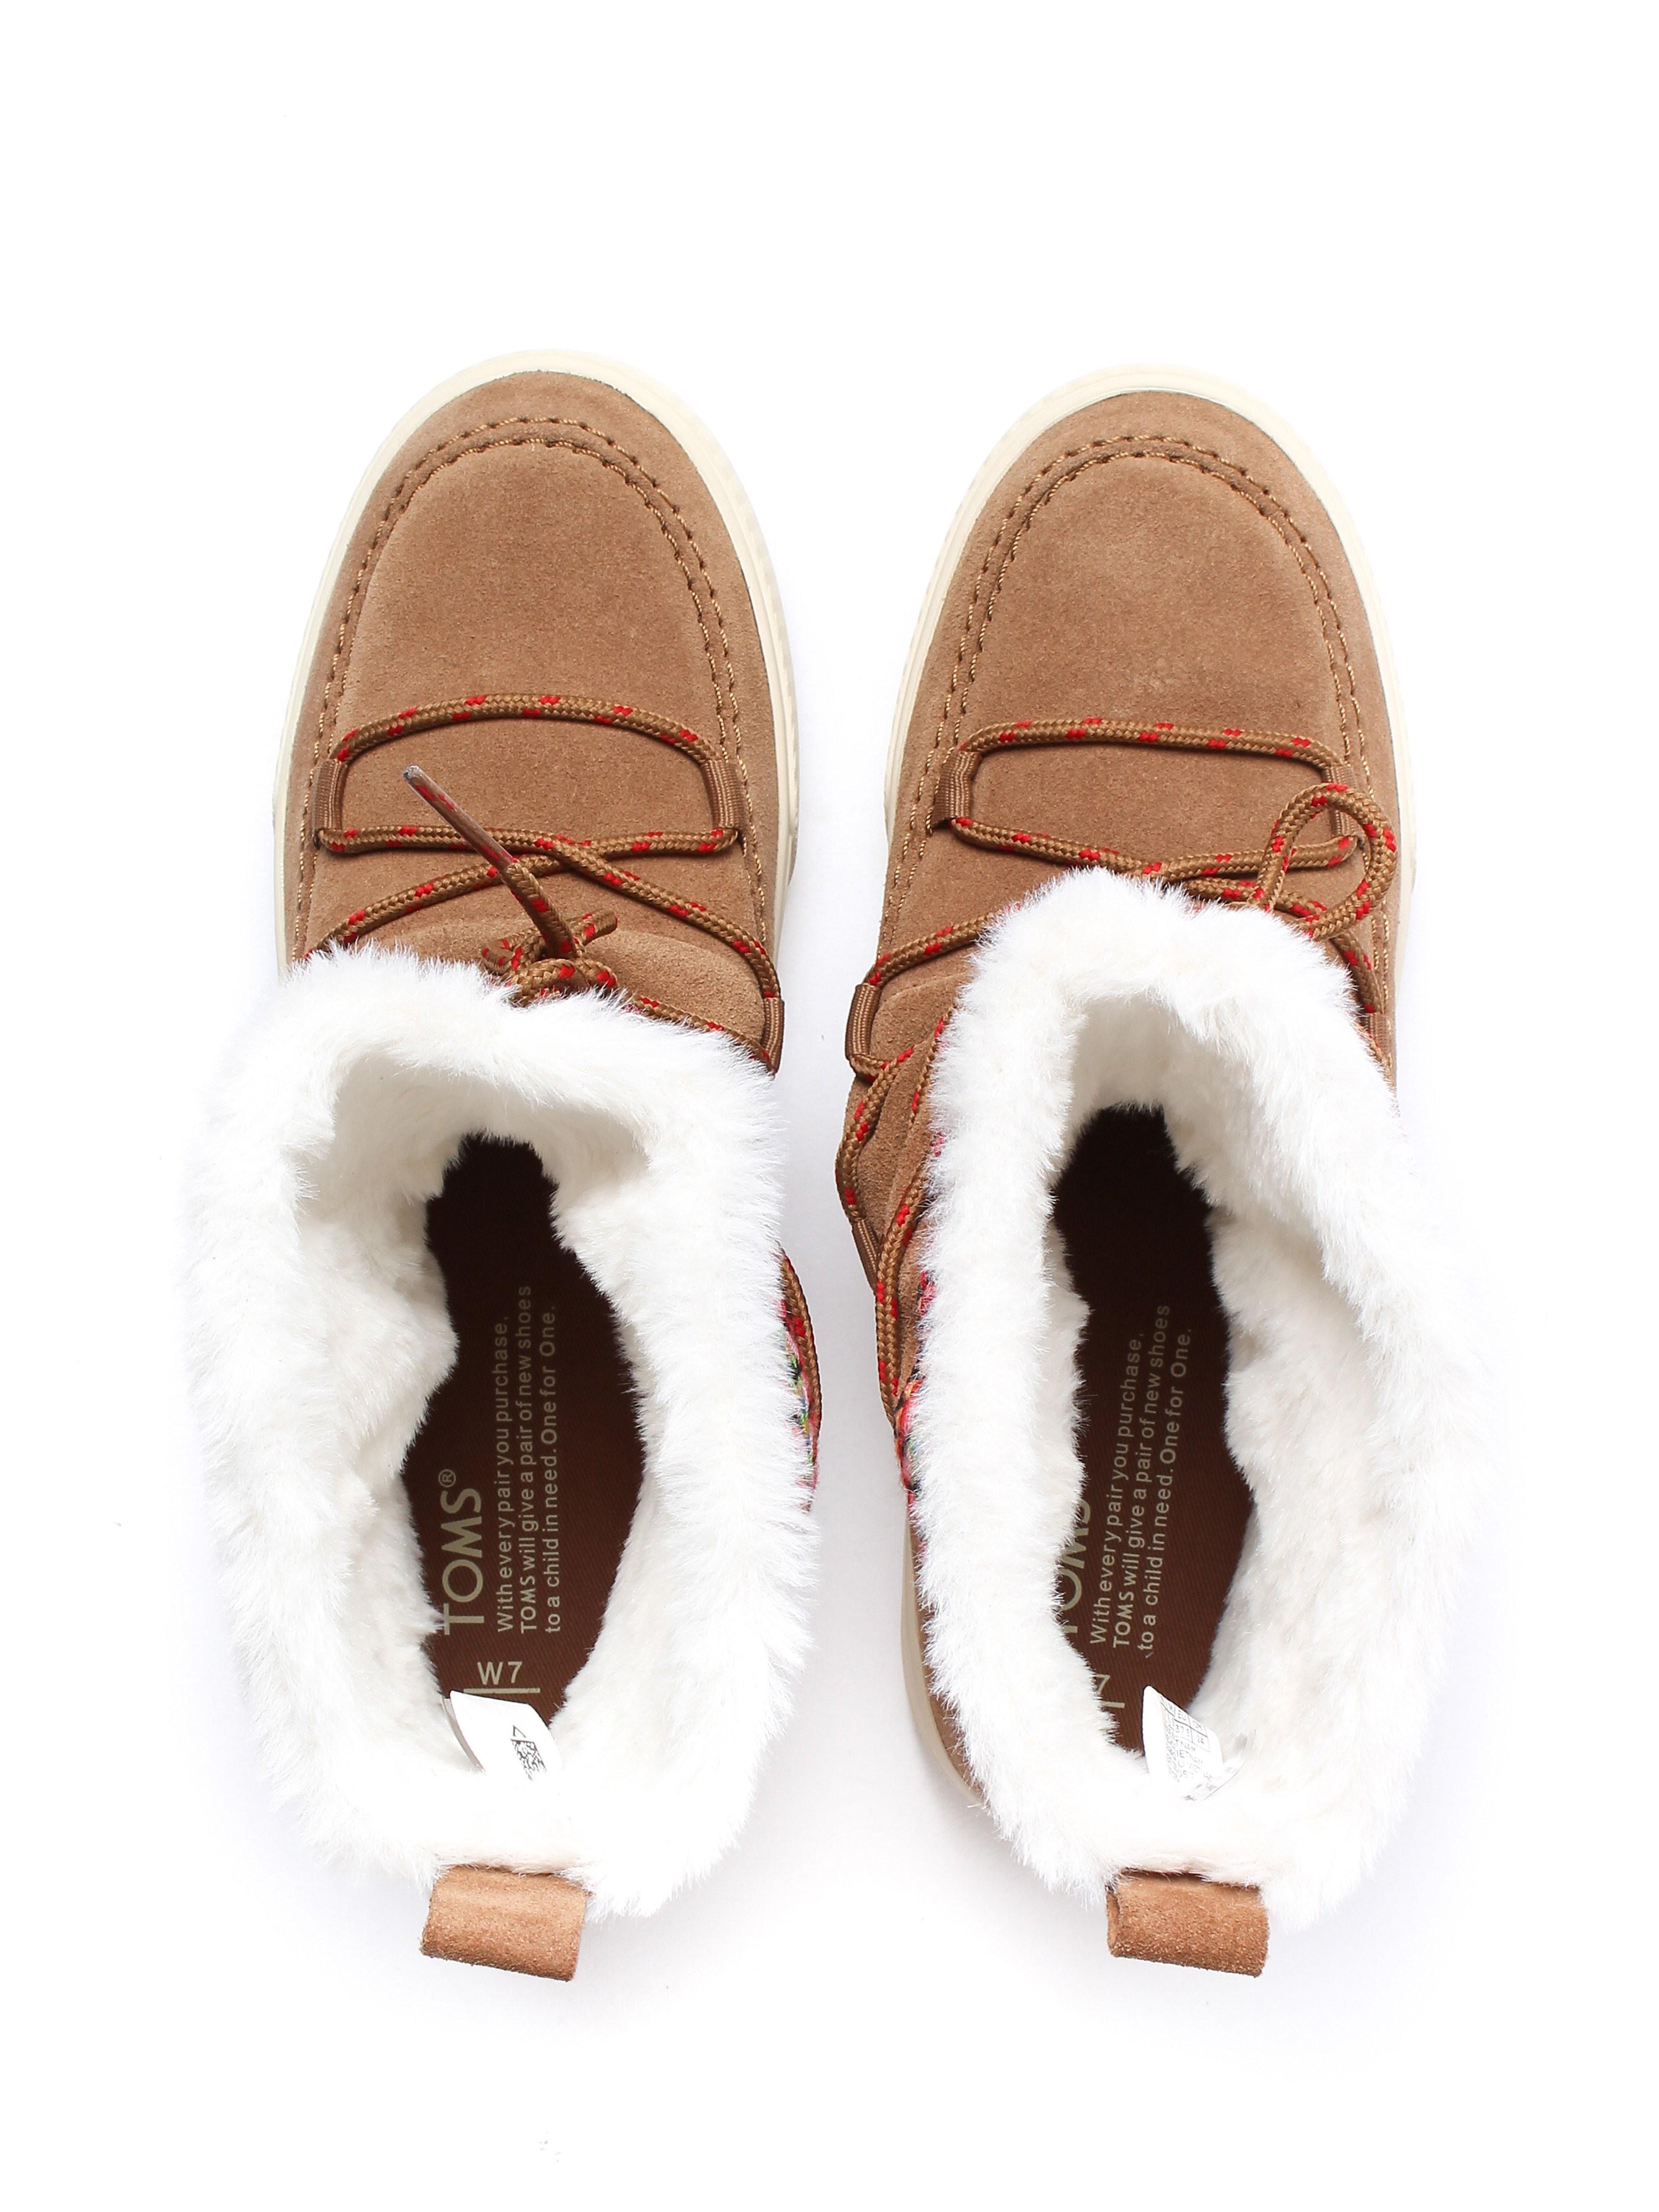 Toms Women's Alpine Waterproof Moccasin Boots - Toffee Suede